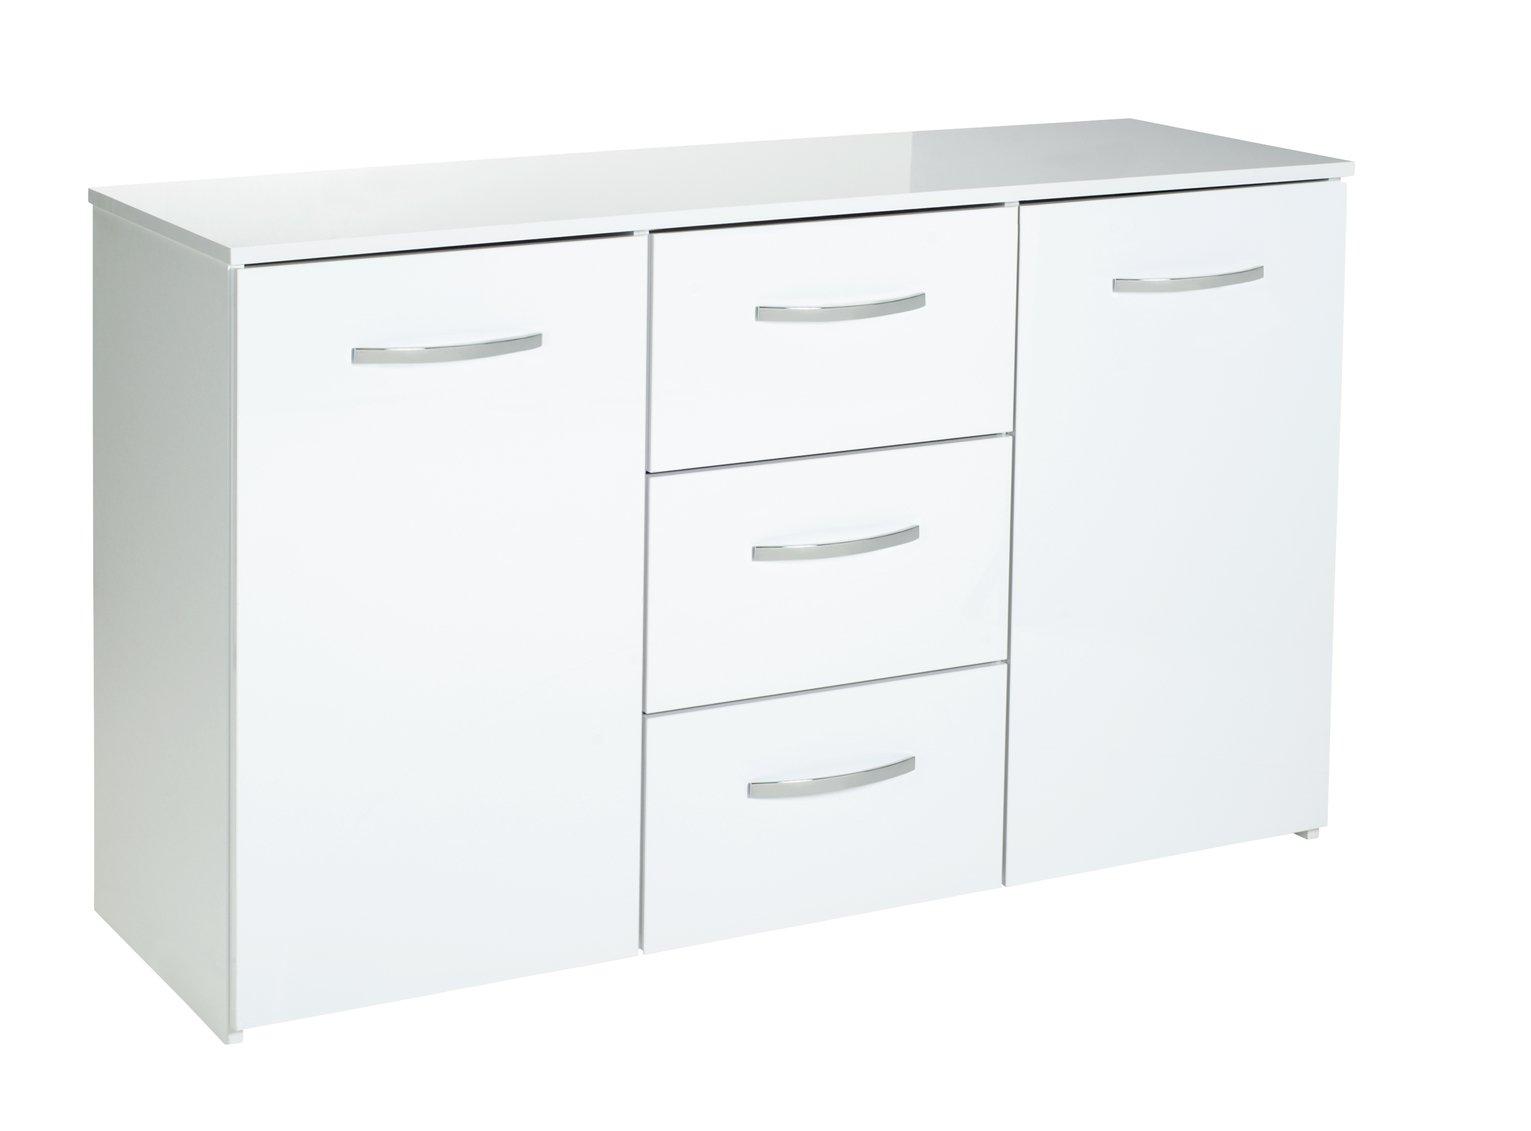 Argos Home Hayward 2 Door 3 Drawer Sideboard - White Gloss